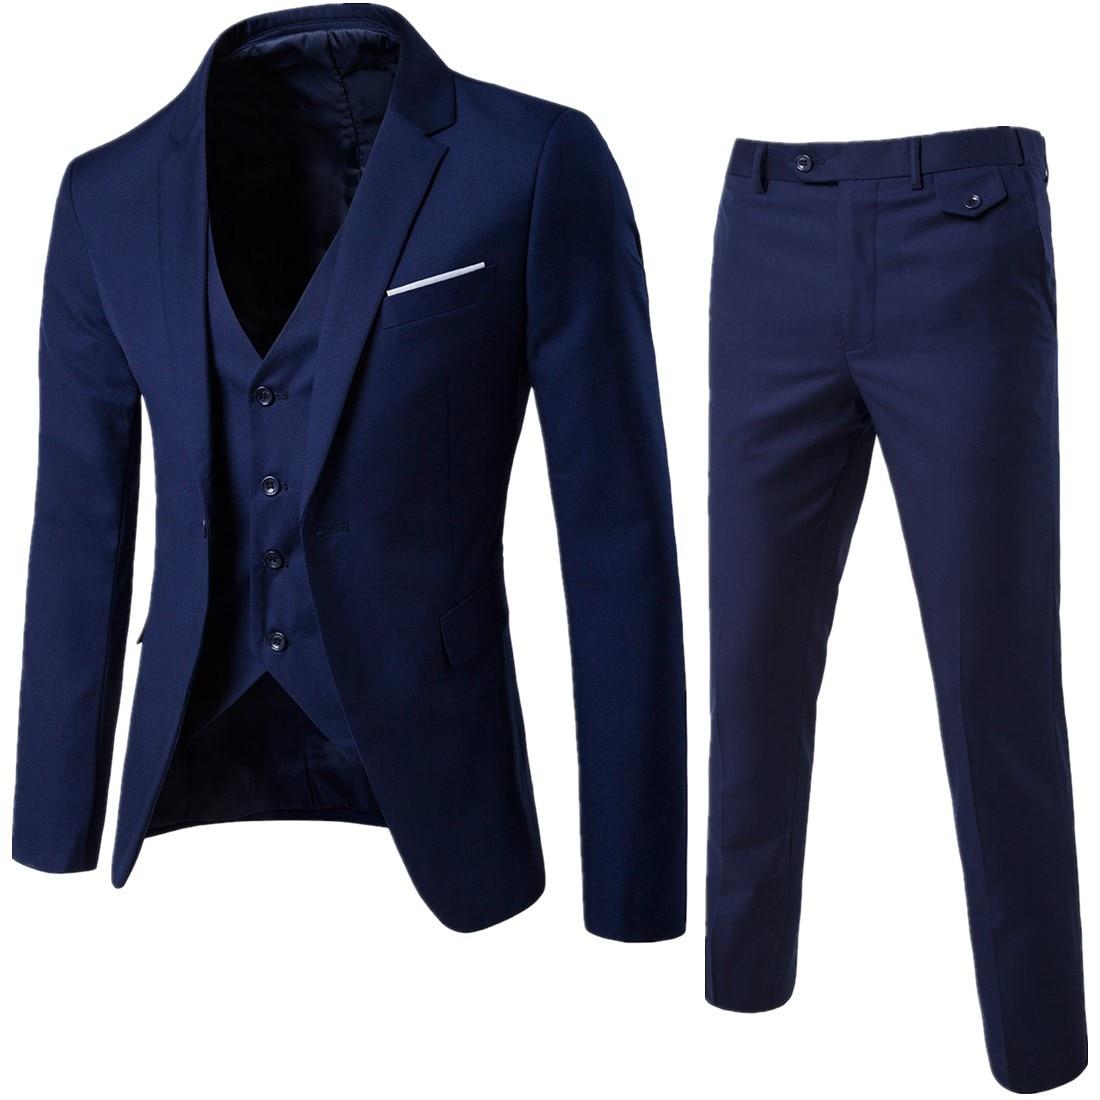 Business Formal Wear Suit Three-piece Set MEN'S Suit Set British Style Men's Workwear Wear Sale Work Clothes